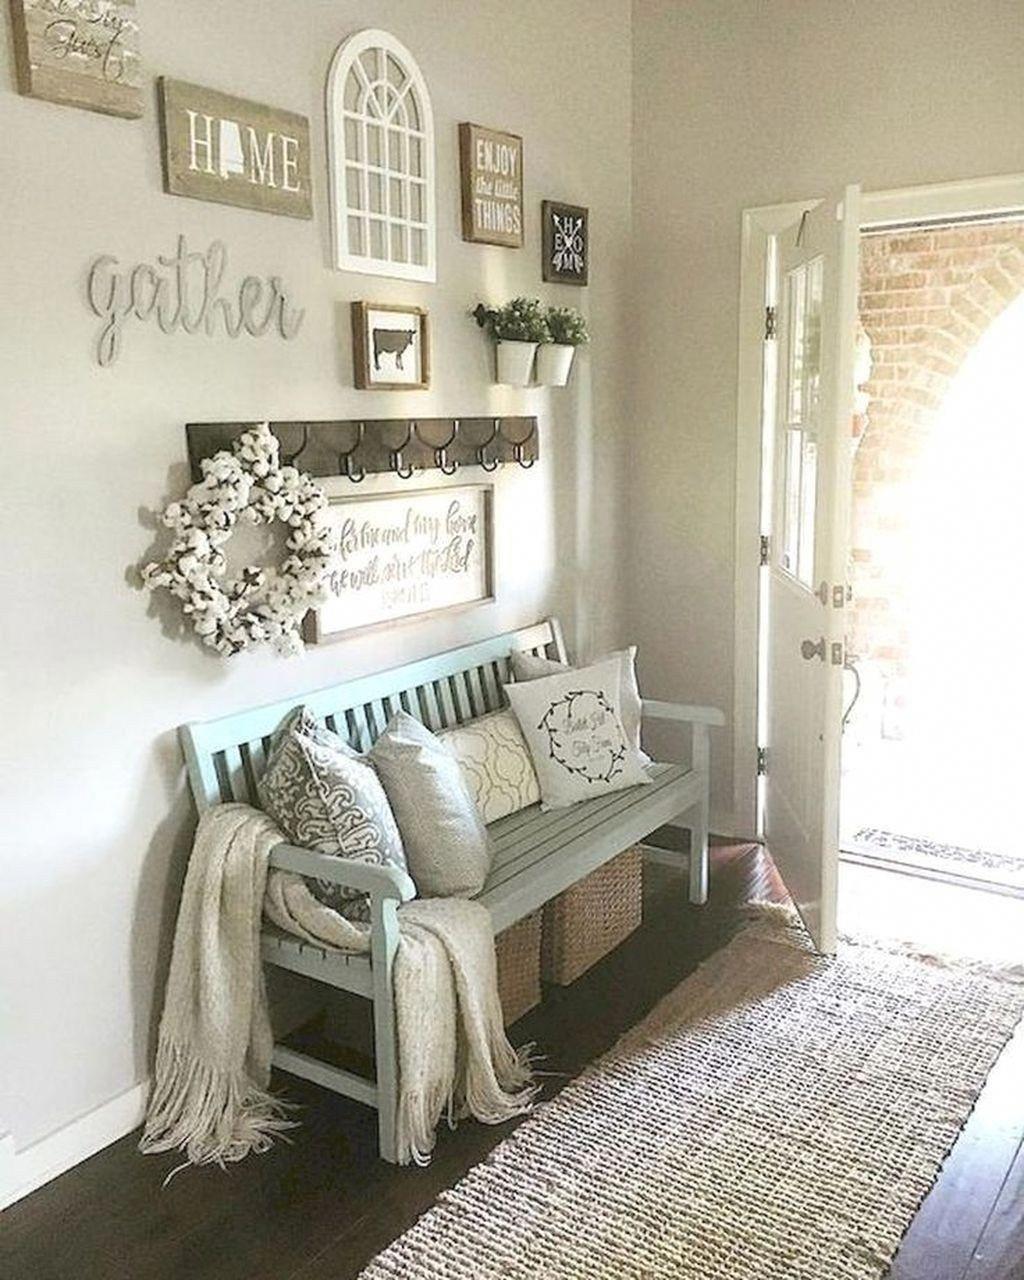 Farmhousehome Decorating Ideas: Cozy Farmhouse Living Room Decor Ideas That Make You Feel